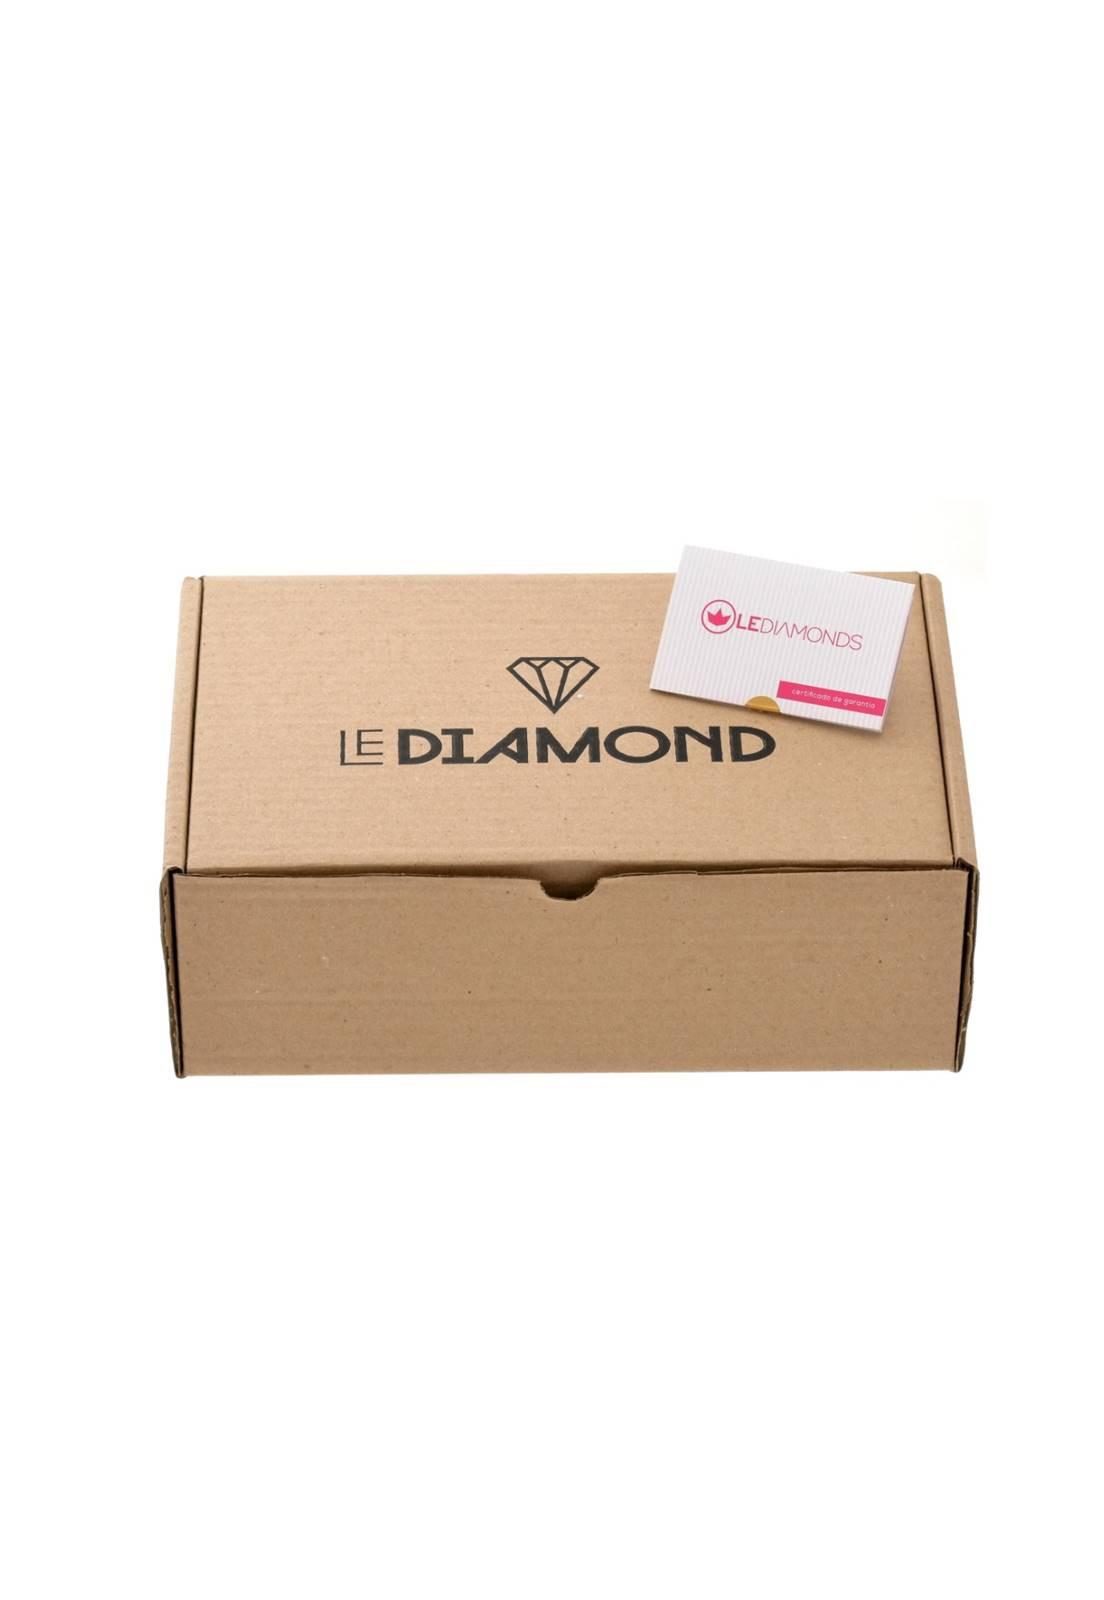 Brinco Le Diamond Aro Duplo com Zircônia Dourado